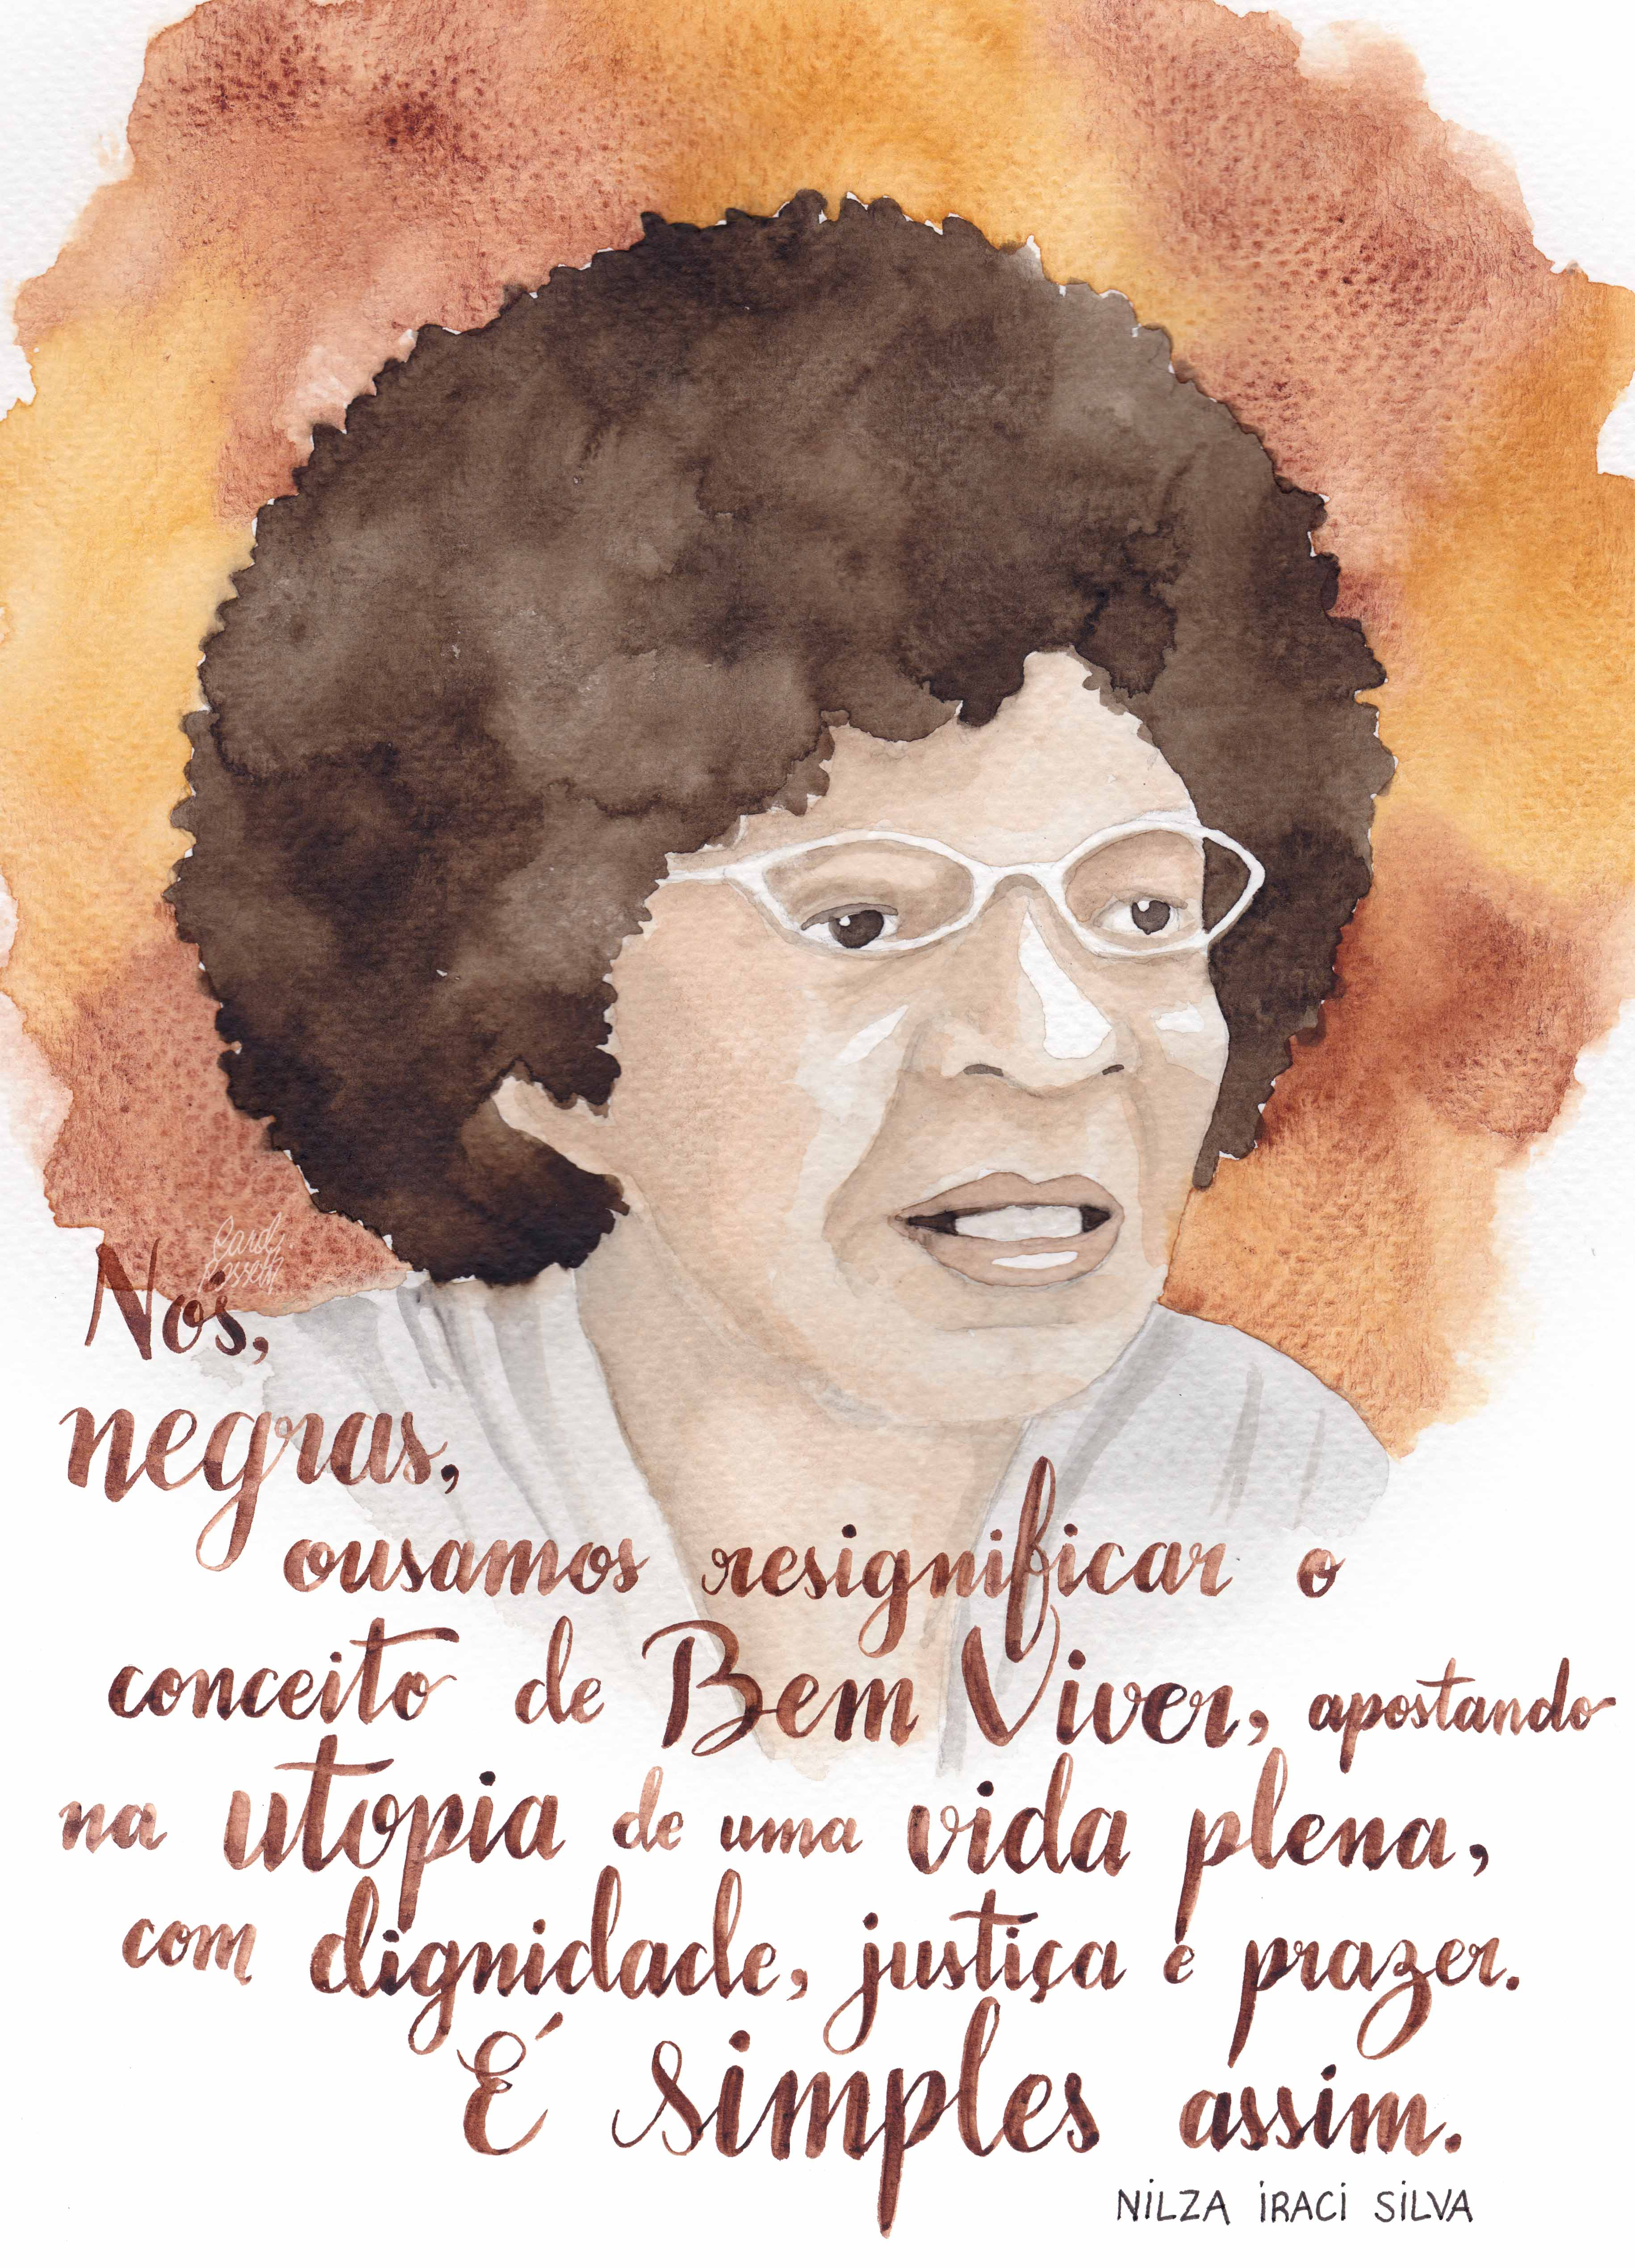 Nilza Iraci Silva